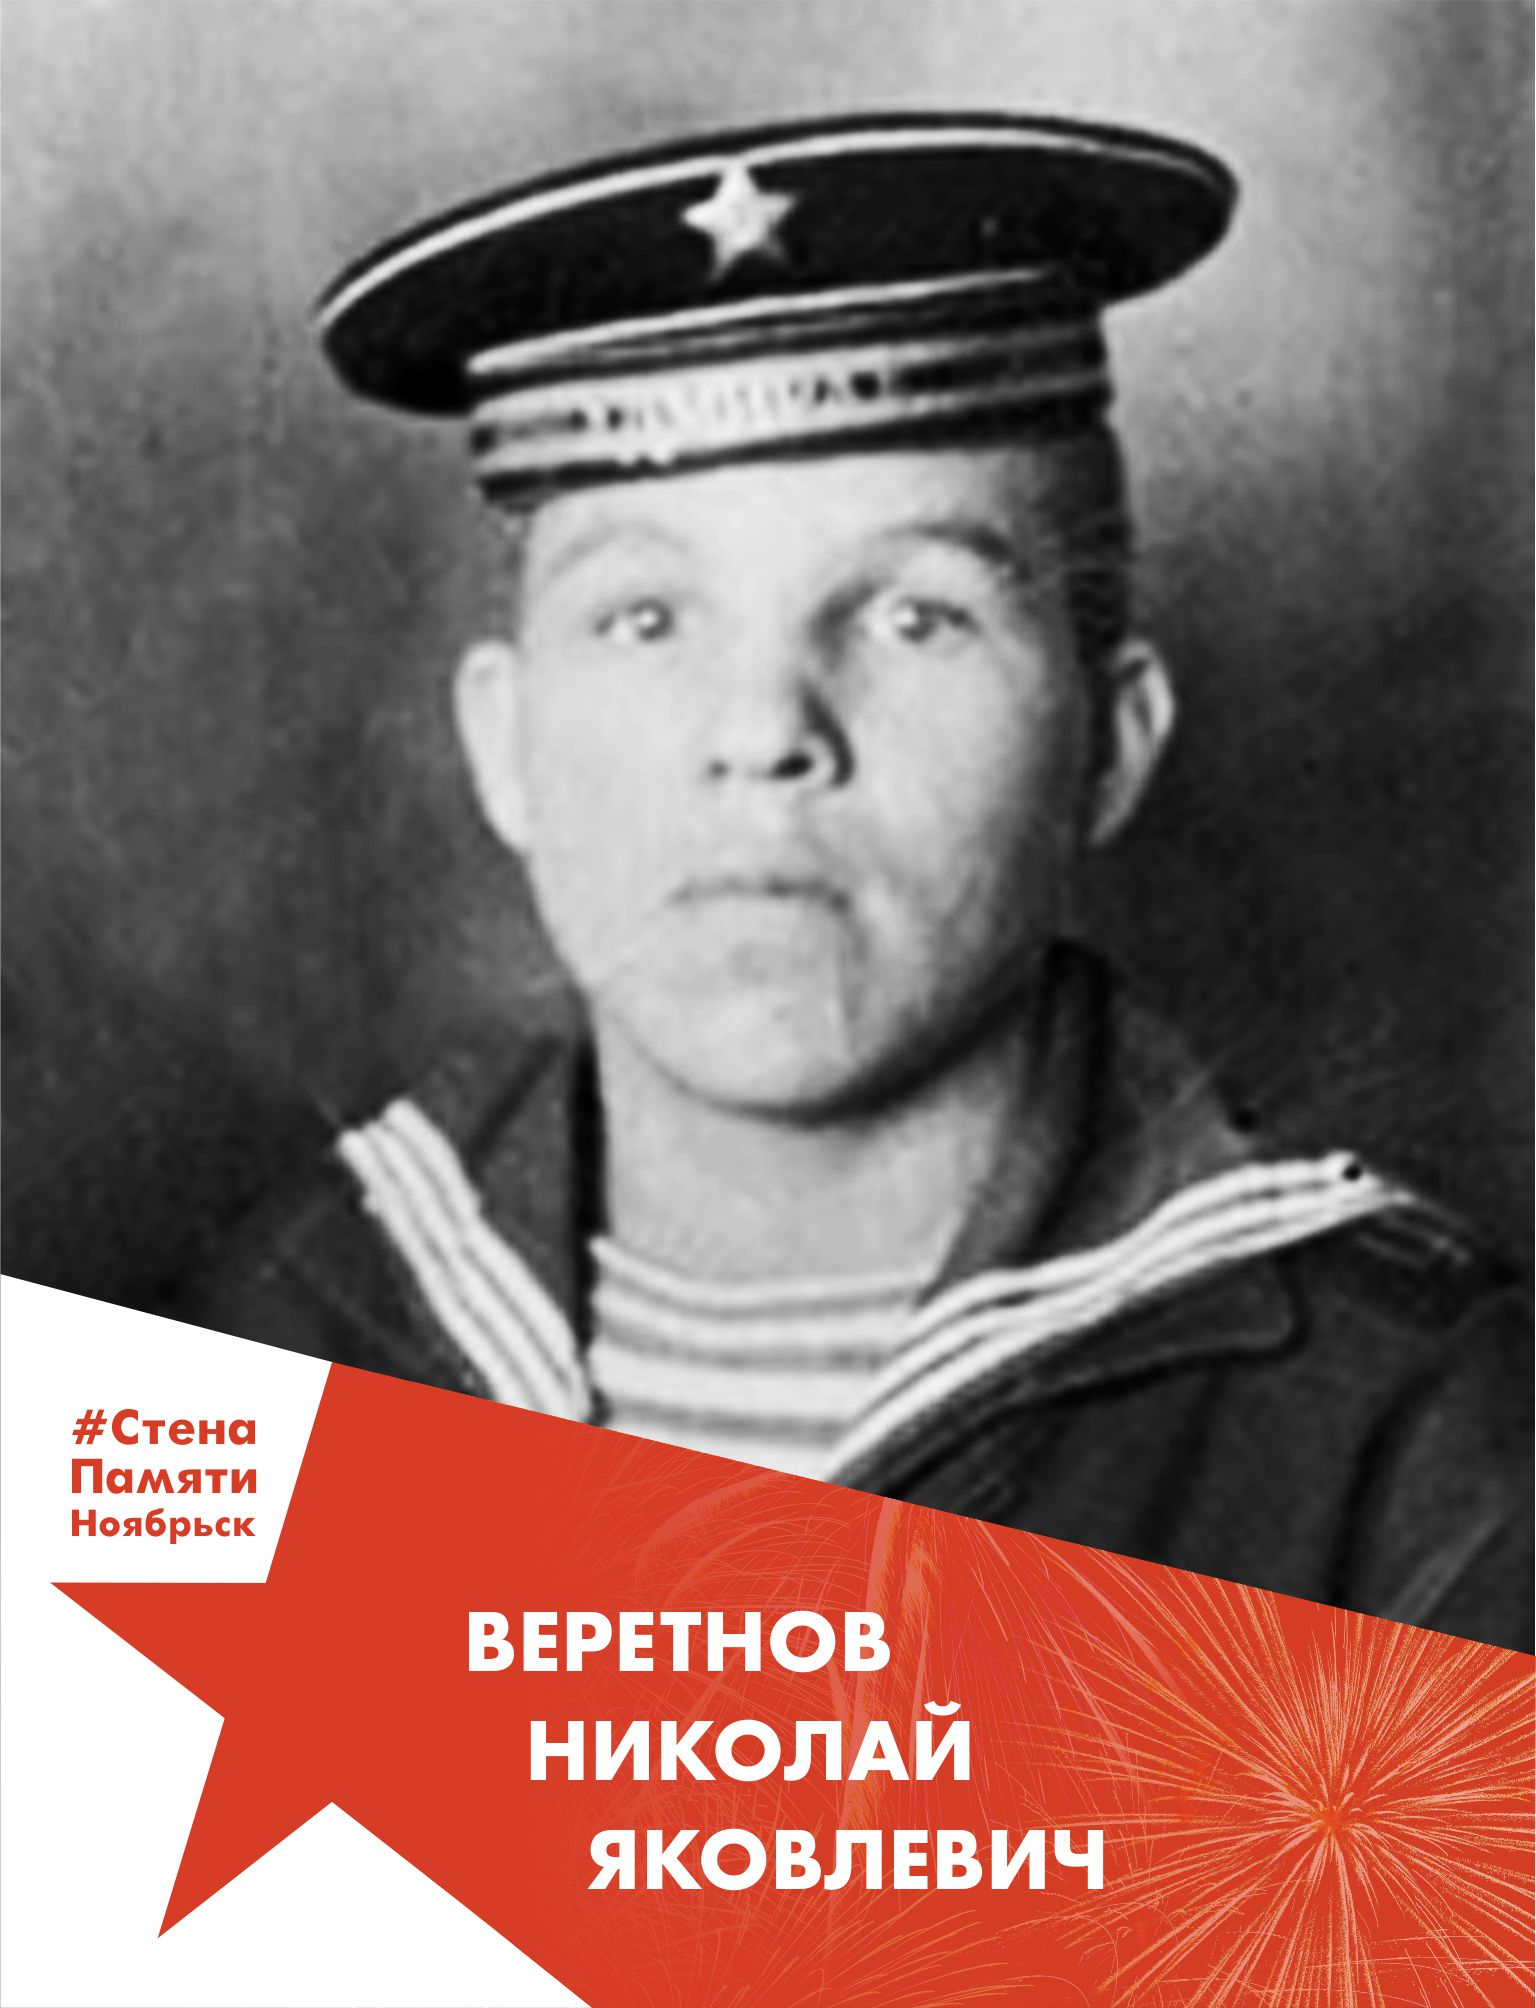 Веретнов Николай Яковлевич